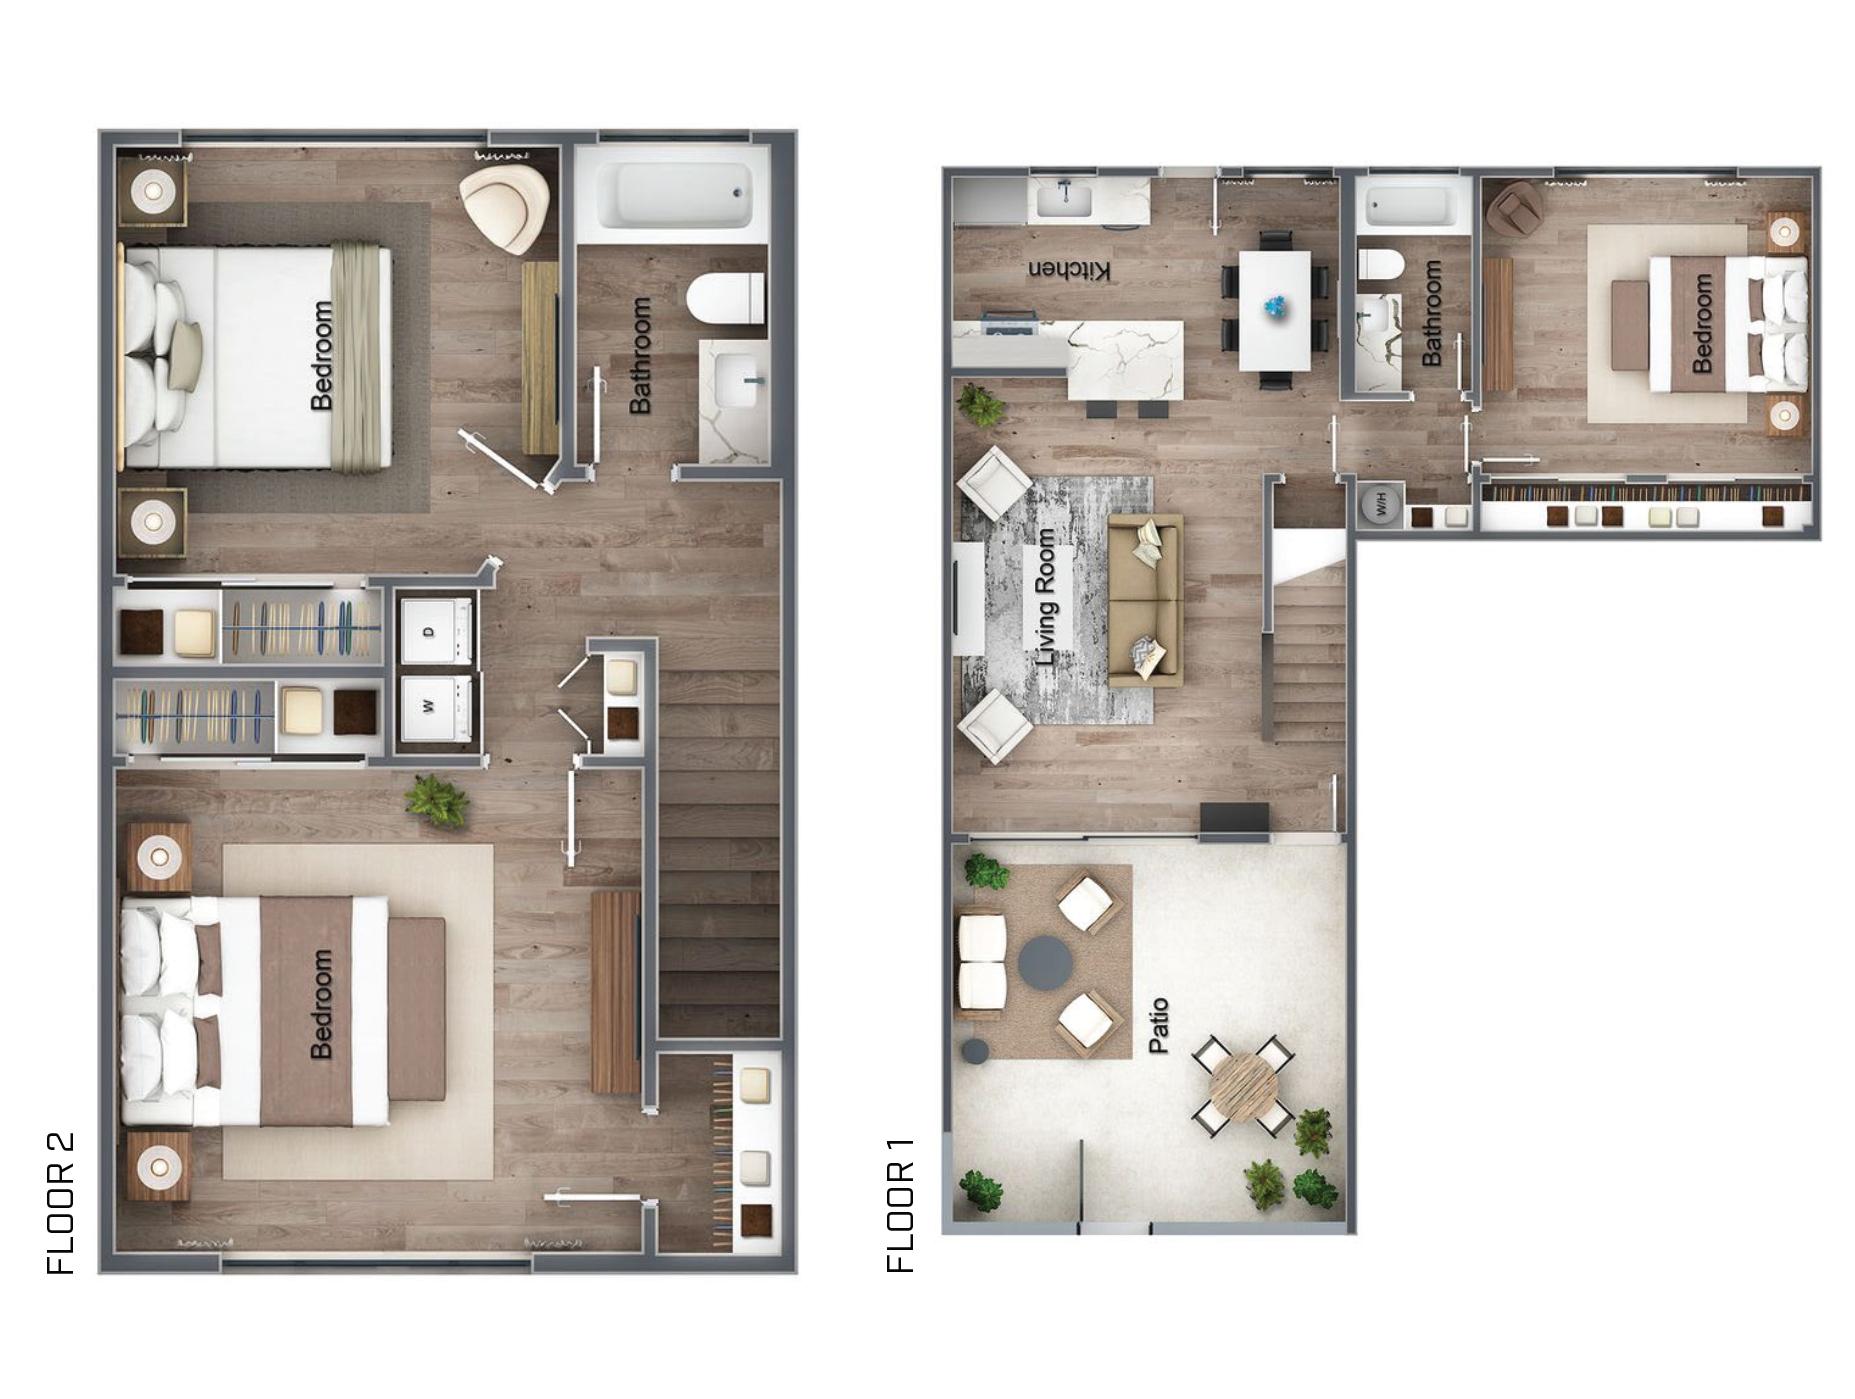 Floor Plans - West 235th